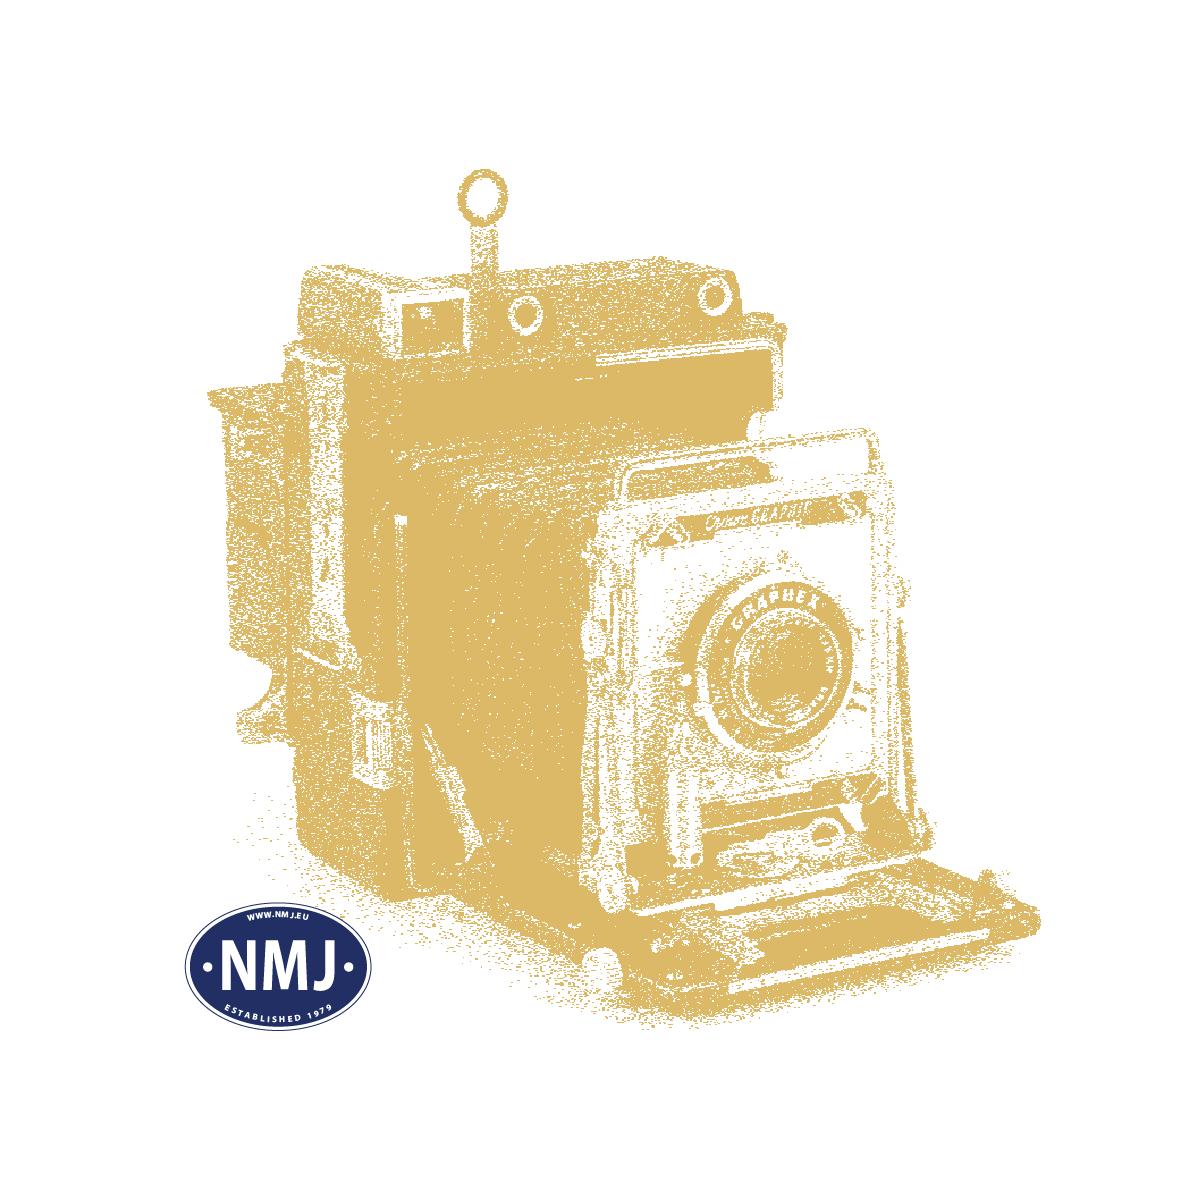 NMJT403.102 - NMJ Topline MAV Bpmz 20-91 113-7, 2. Cl. Open